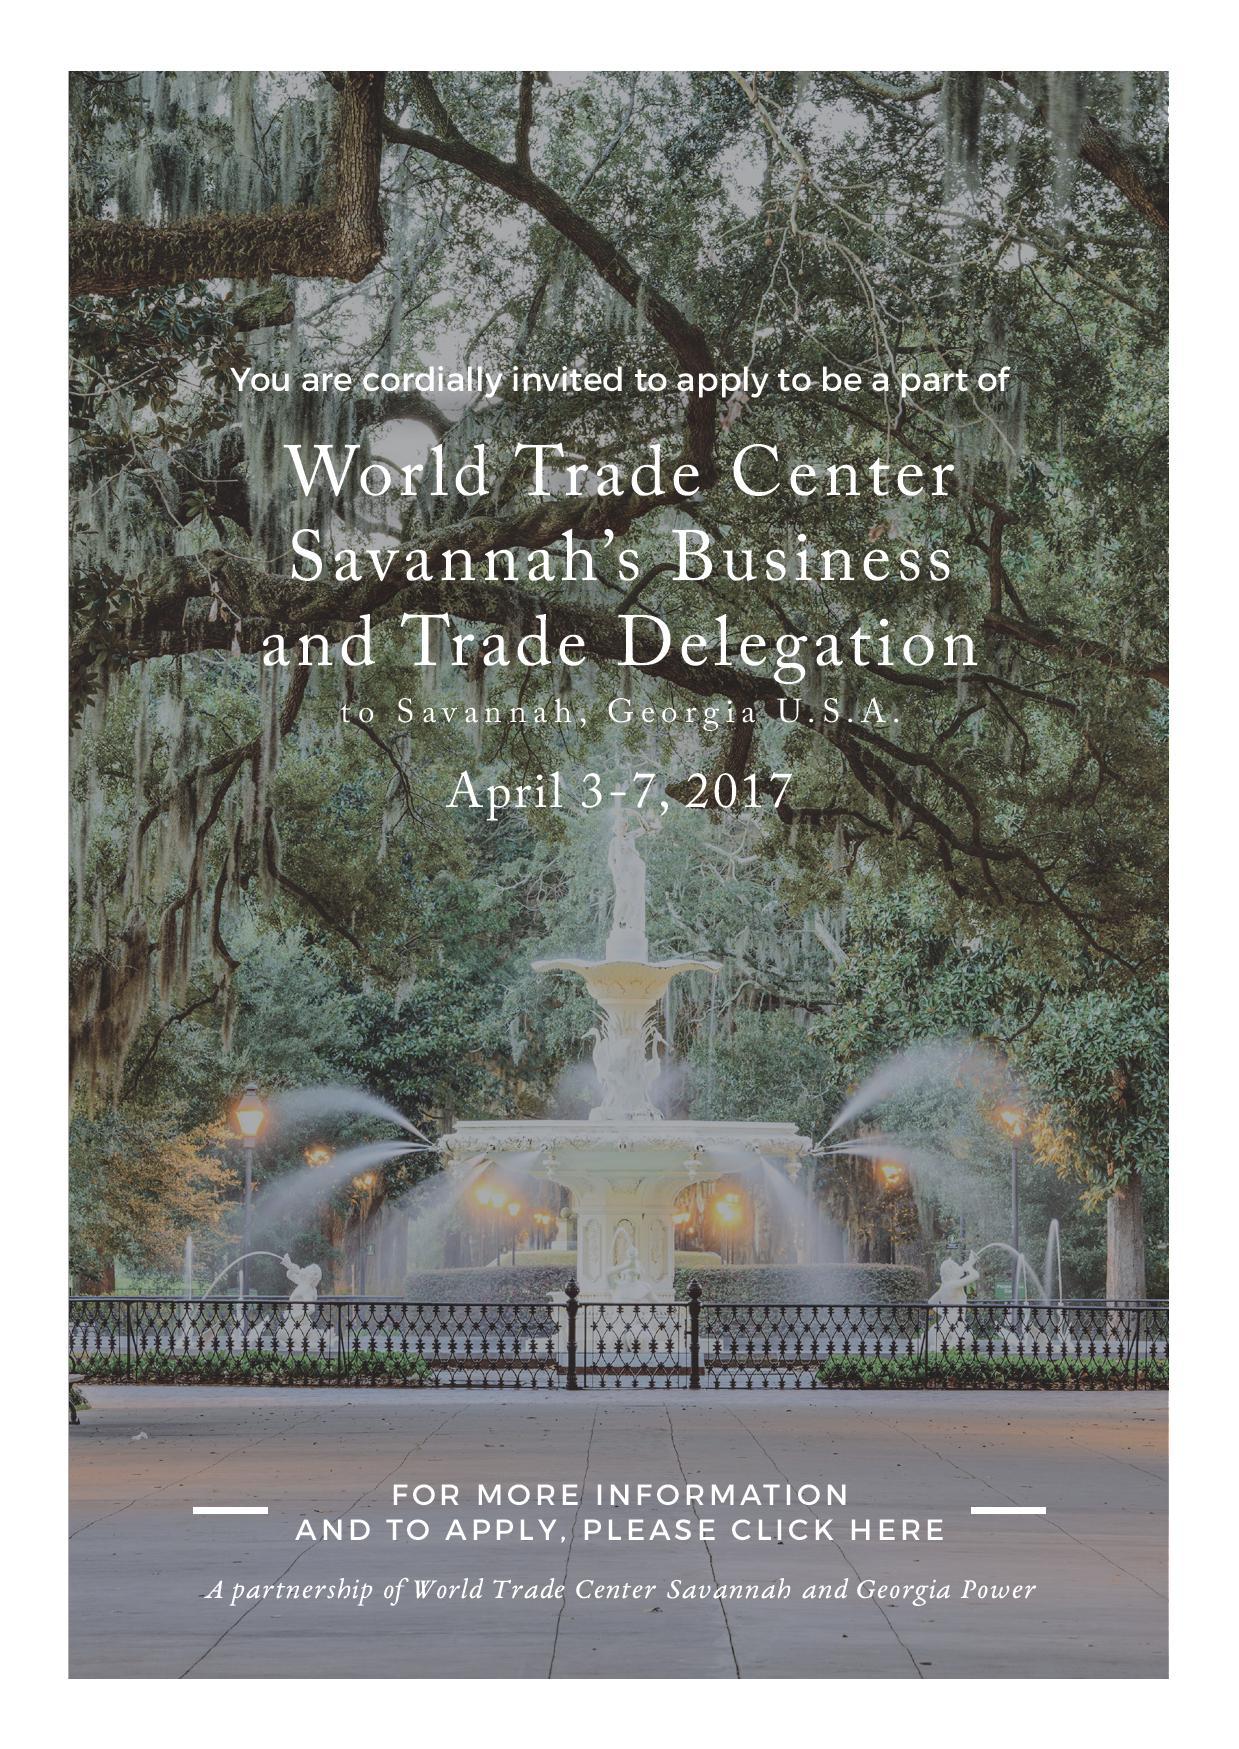 INVITATION: World Trade Center Savannah's Business and Trade Delegation to Georgia USA